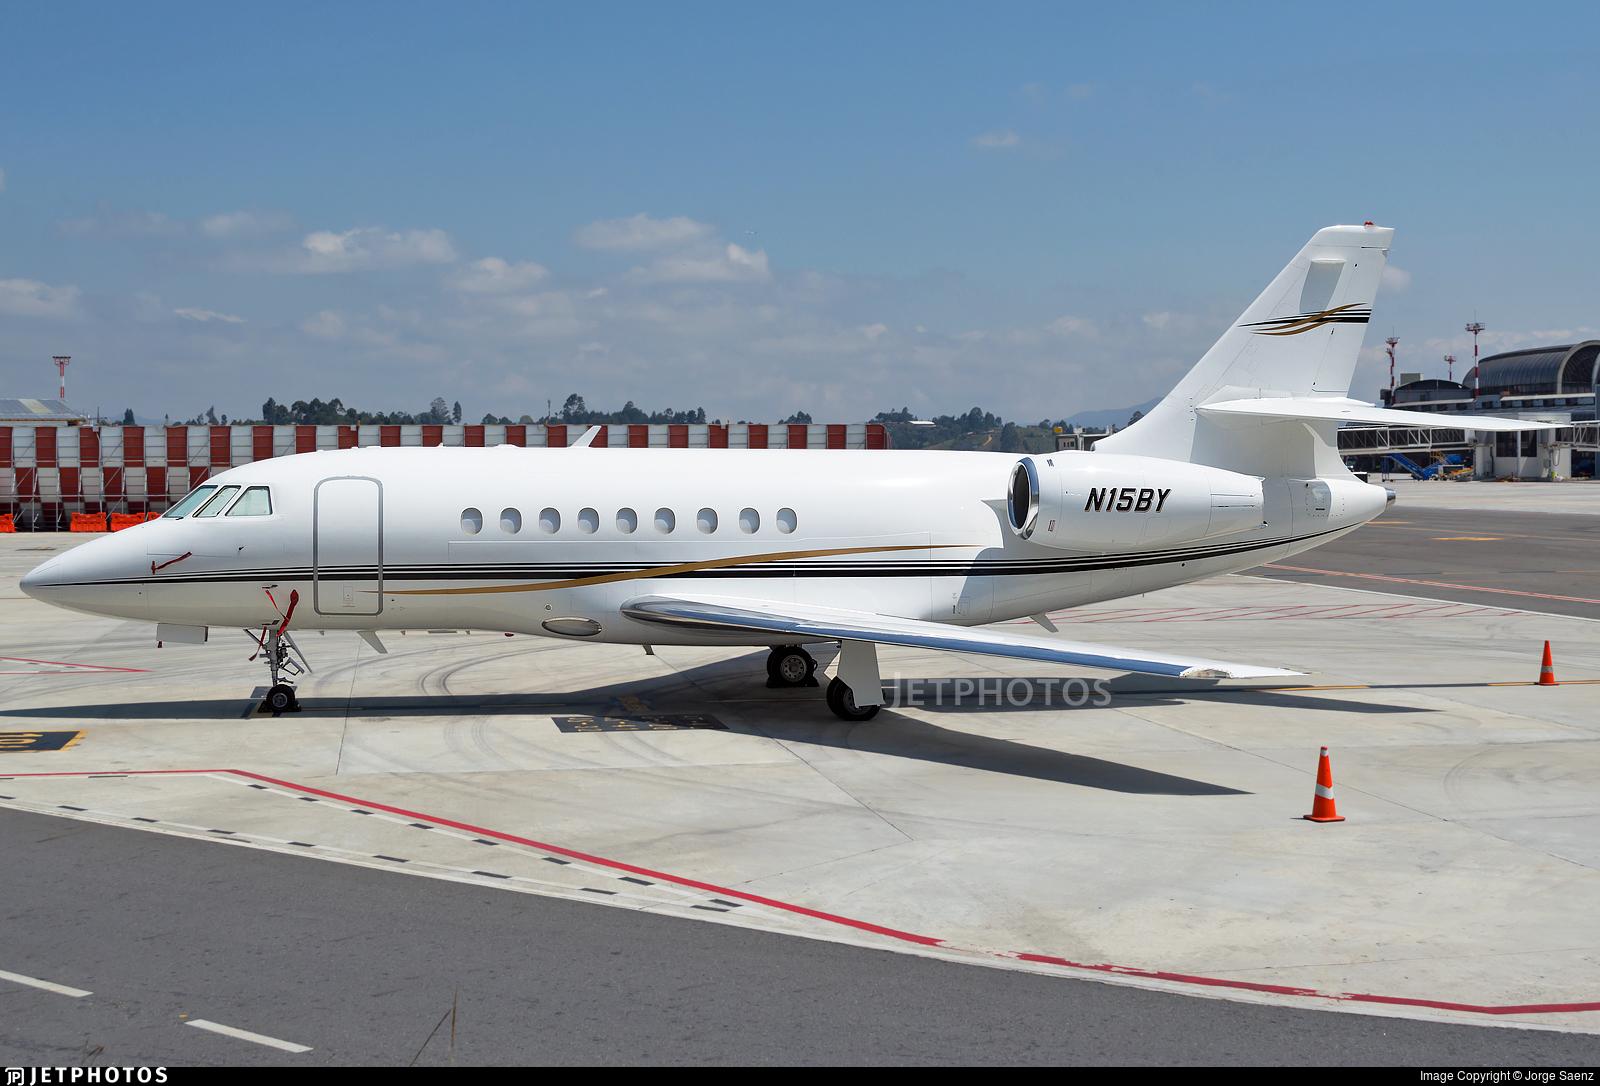 N15BY - Dassault Falcon 2000 - Private